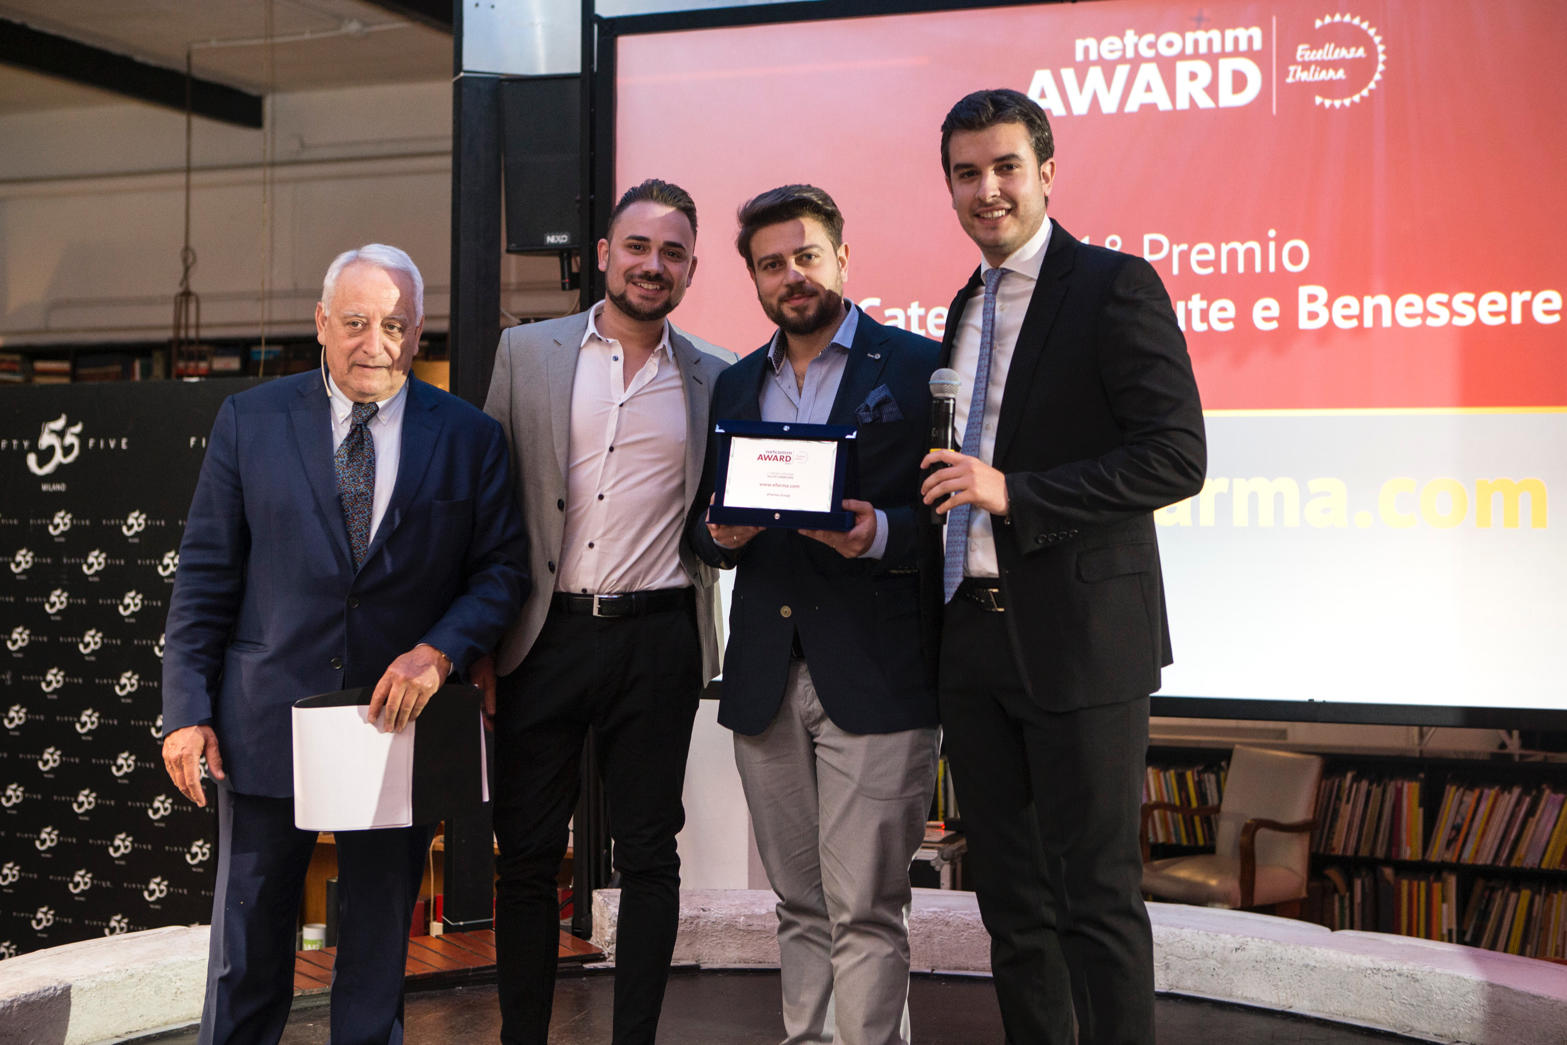 netcomm award efarma ecommerce farmaci